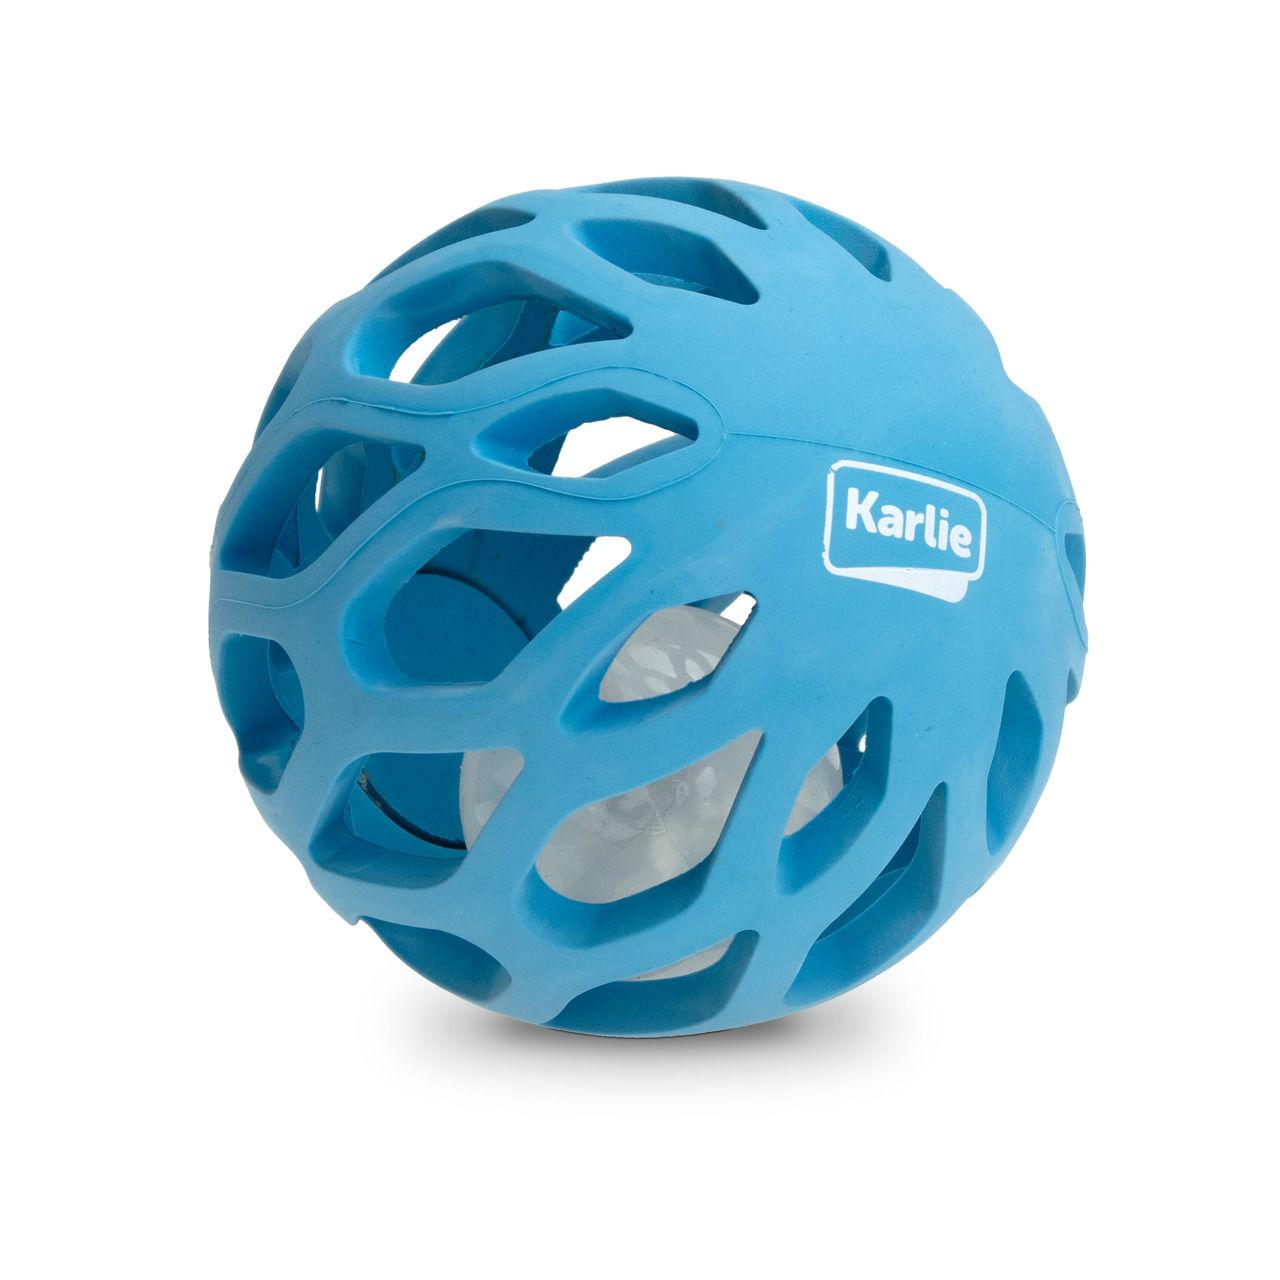 Karlie Hunde Gitterball mit TPR LED Leuchtkugel, ø: 11.5 cm blau